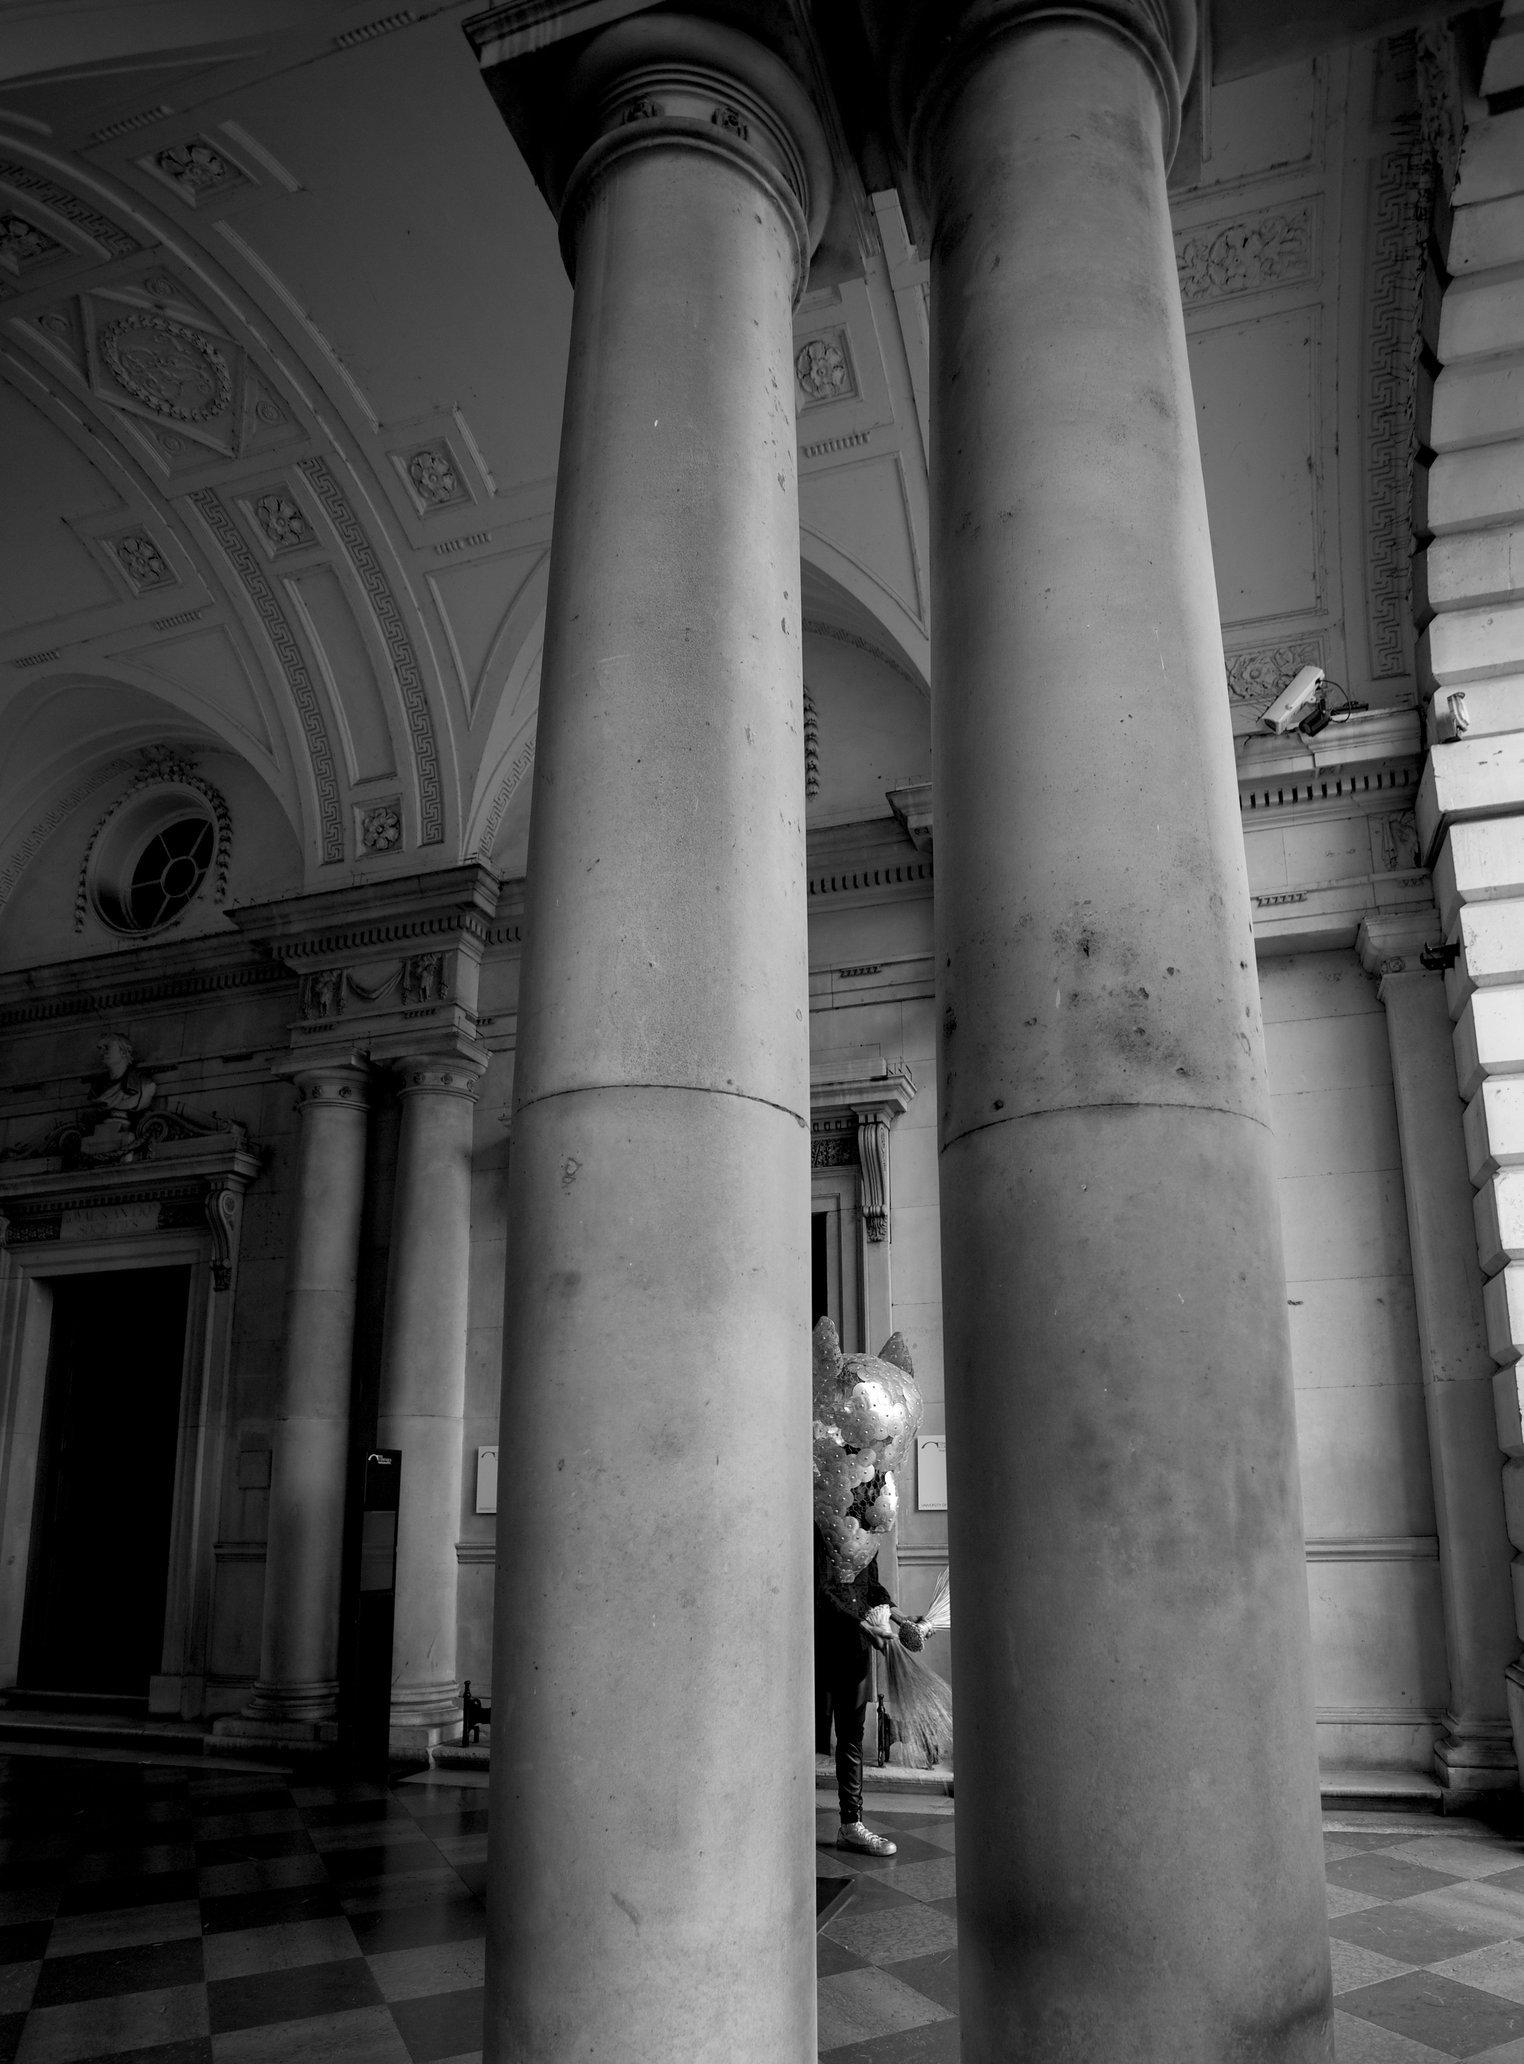 Columns_1.jpg